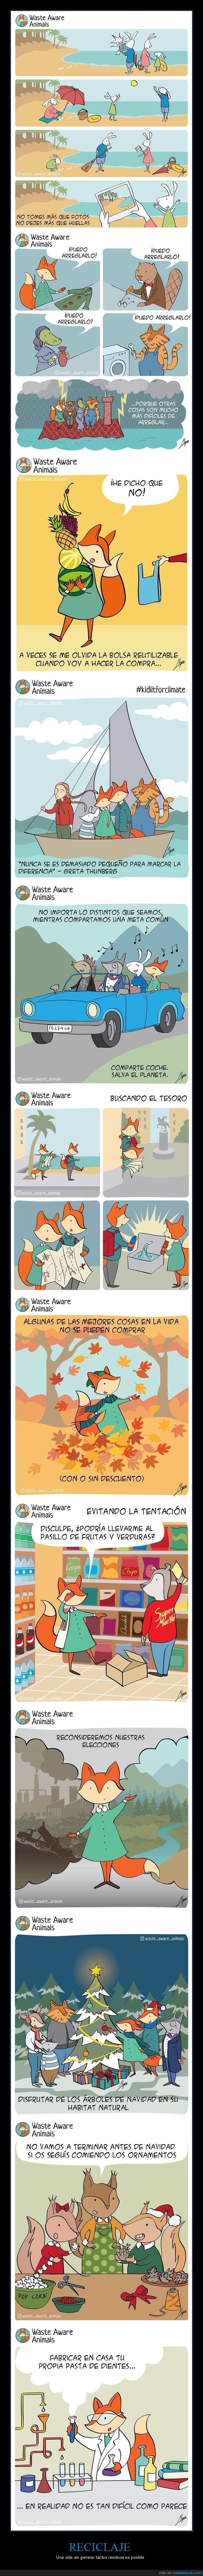 cambio climático,comics,reciclaje